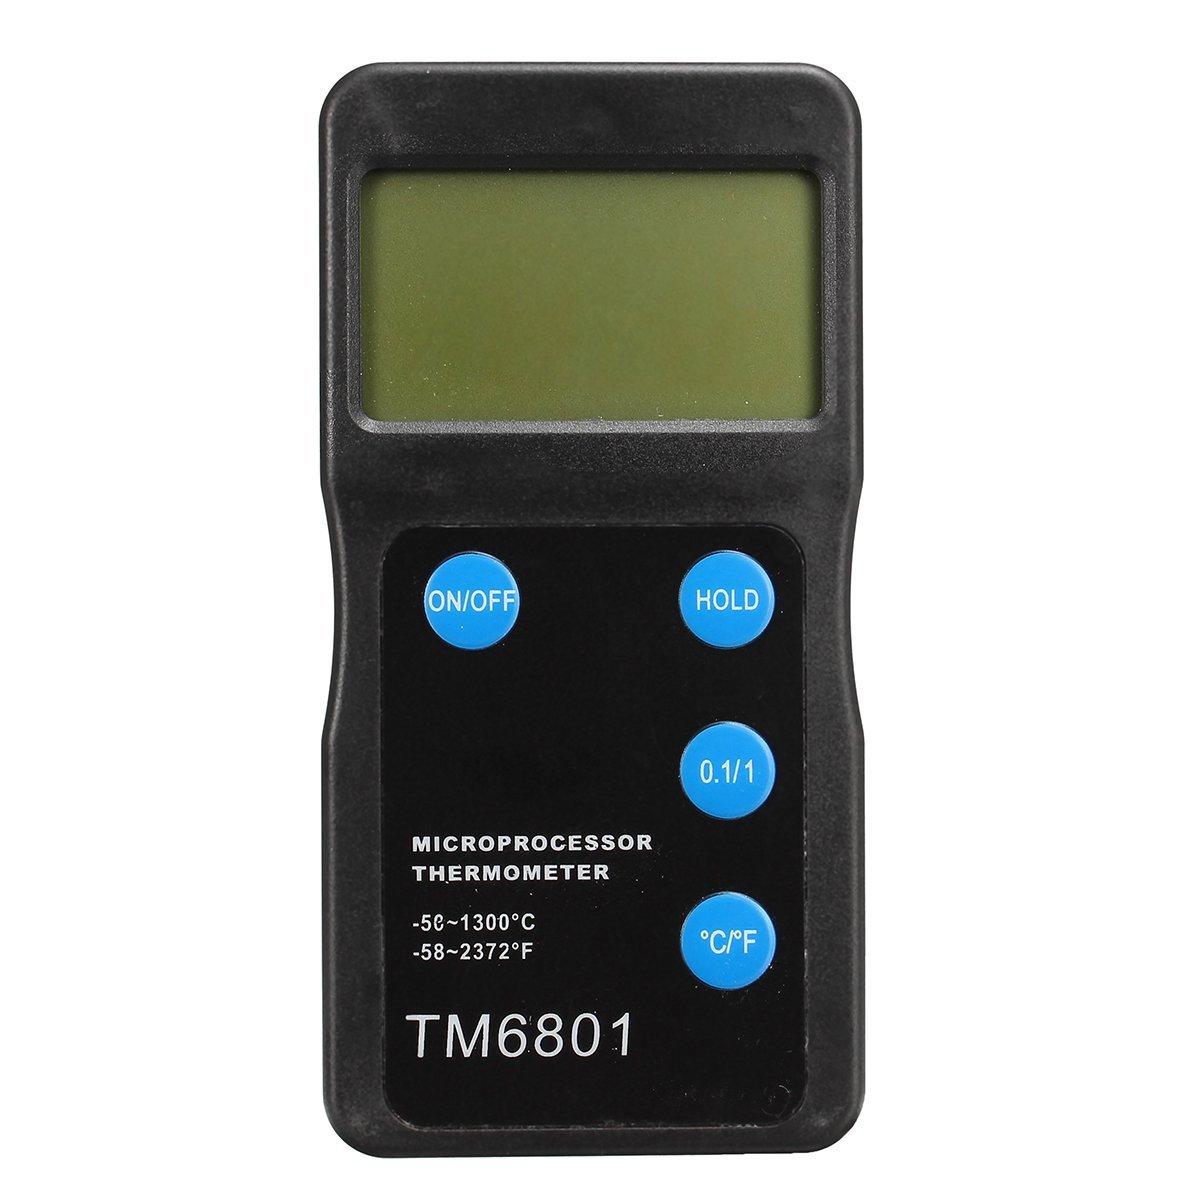 QOJA tm6801 high temperature microprocessor thermometer pyrometer